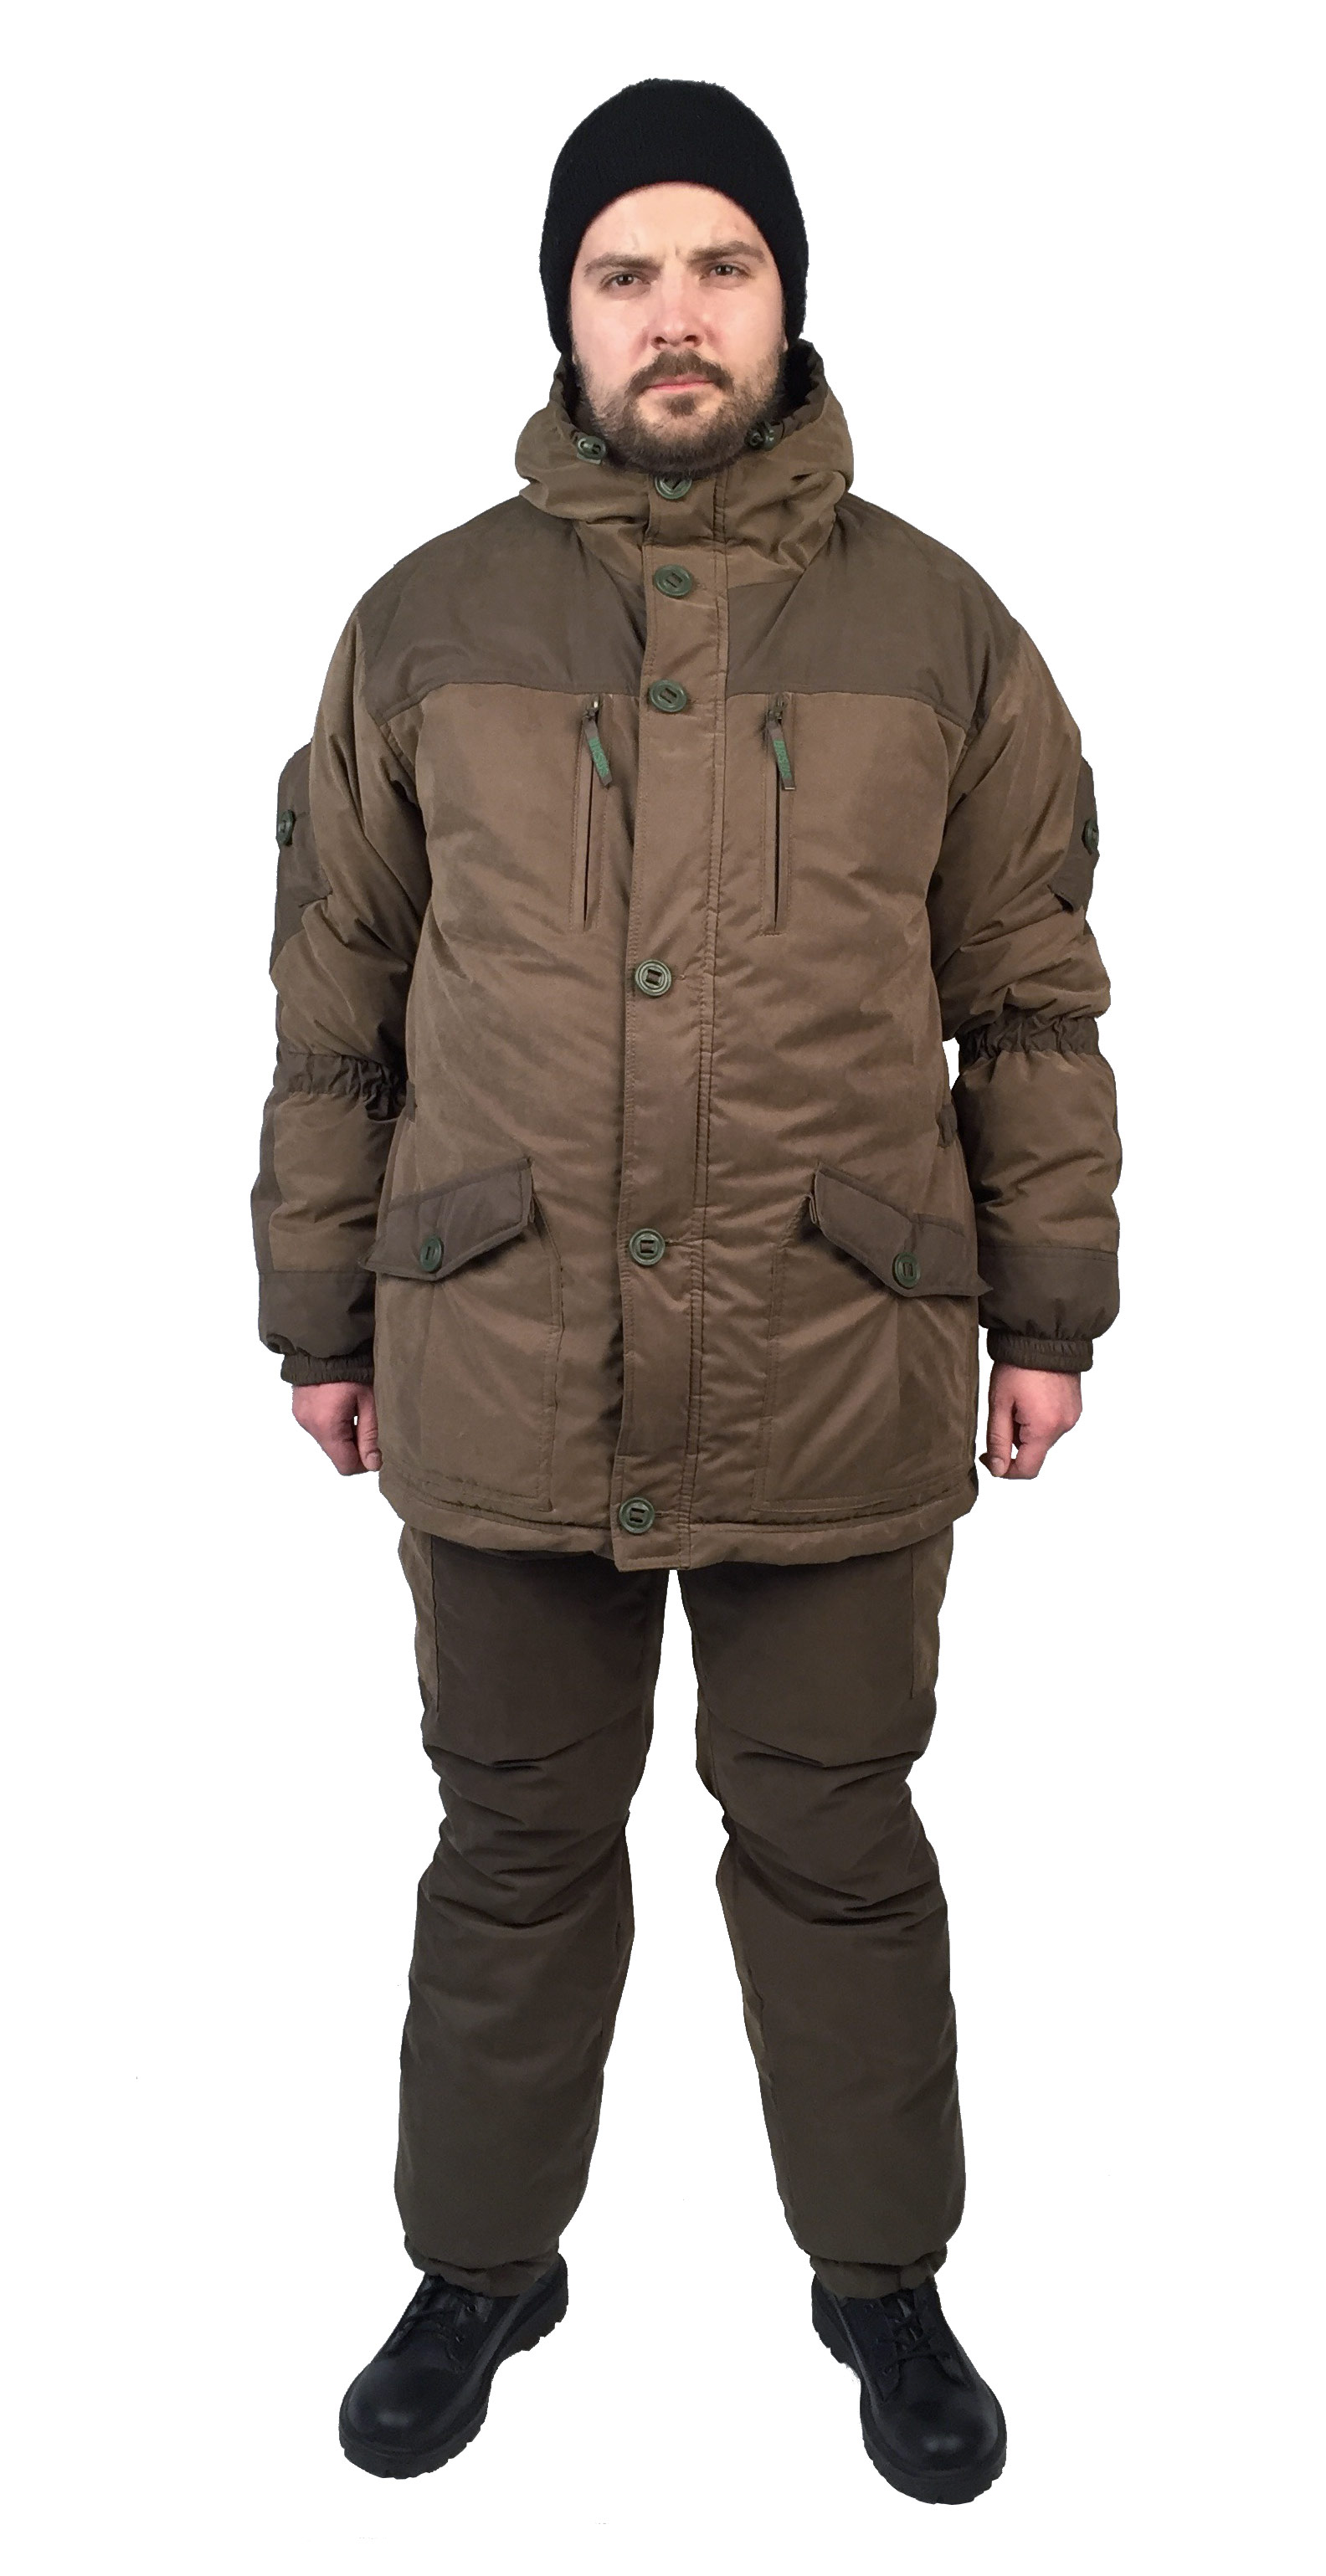 Костюм мужской Nordwig Donbass зимний т. Канада Комби, Зимние костюмы - арт. 927200258